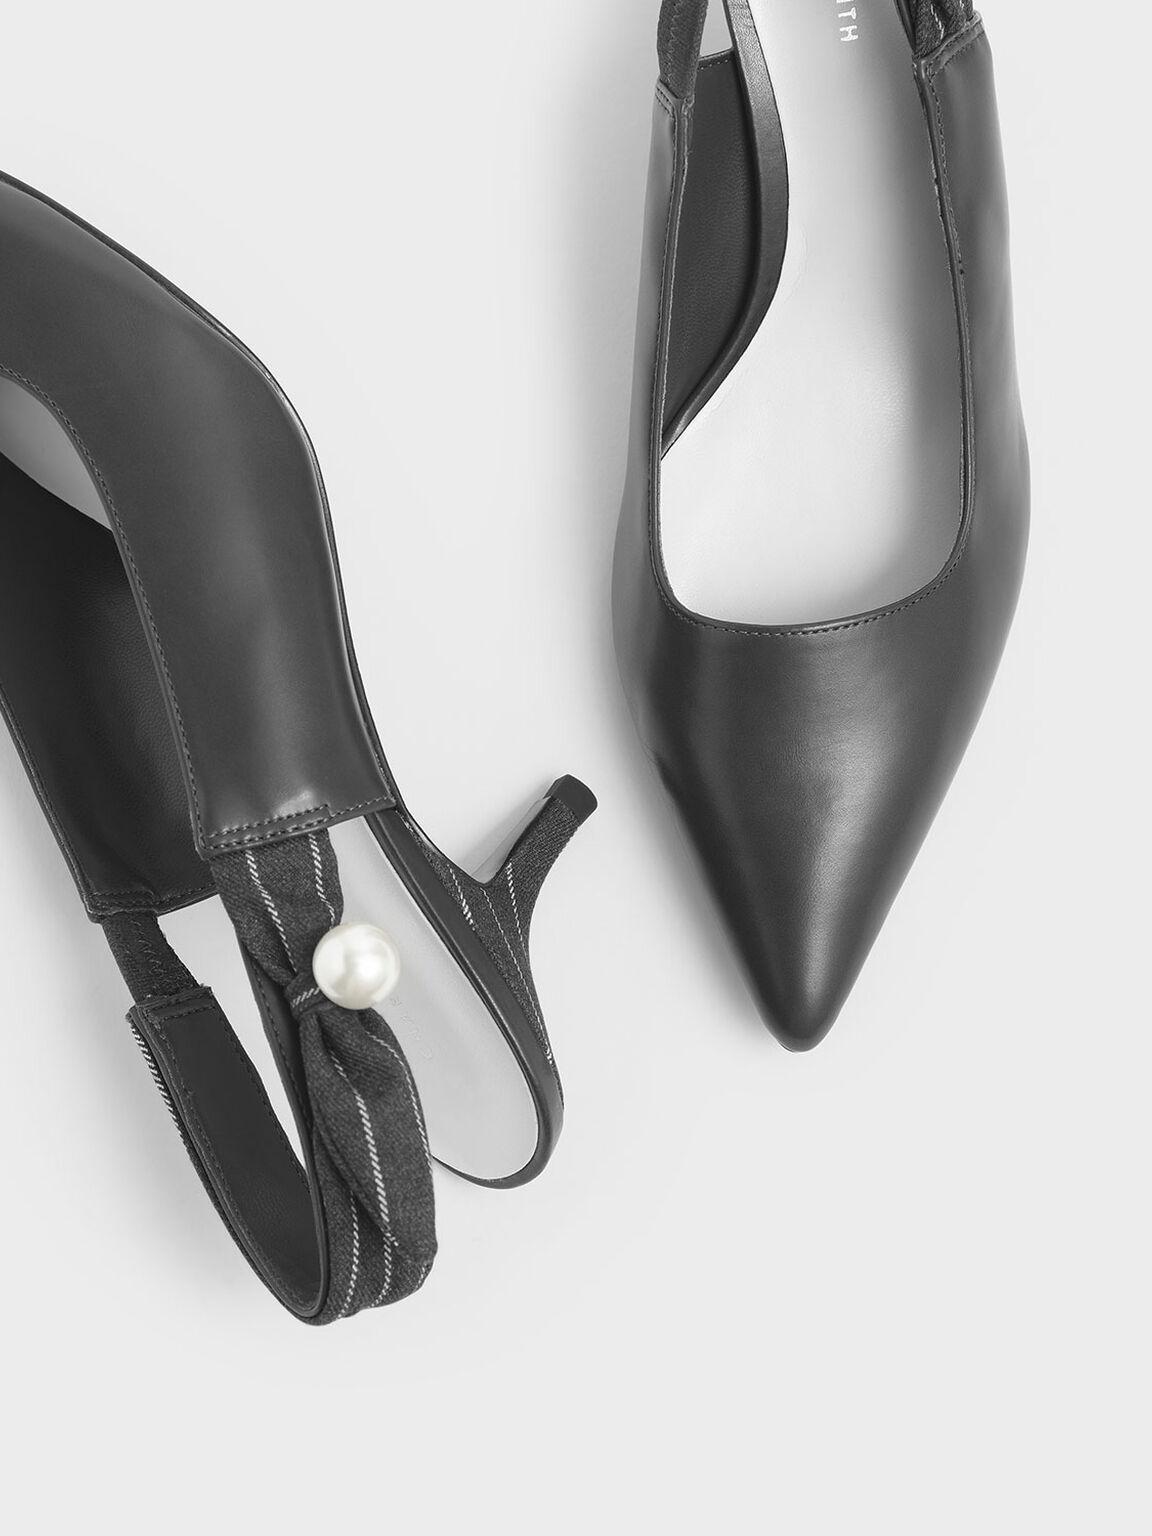 Embellished Pinstripe Slingback Kitten Heels, Dark Grey, hi-res